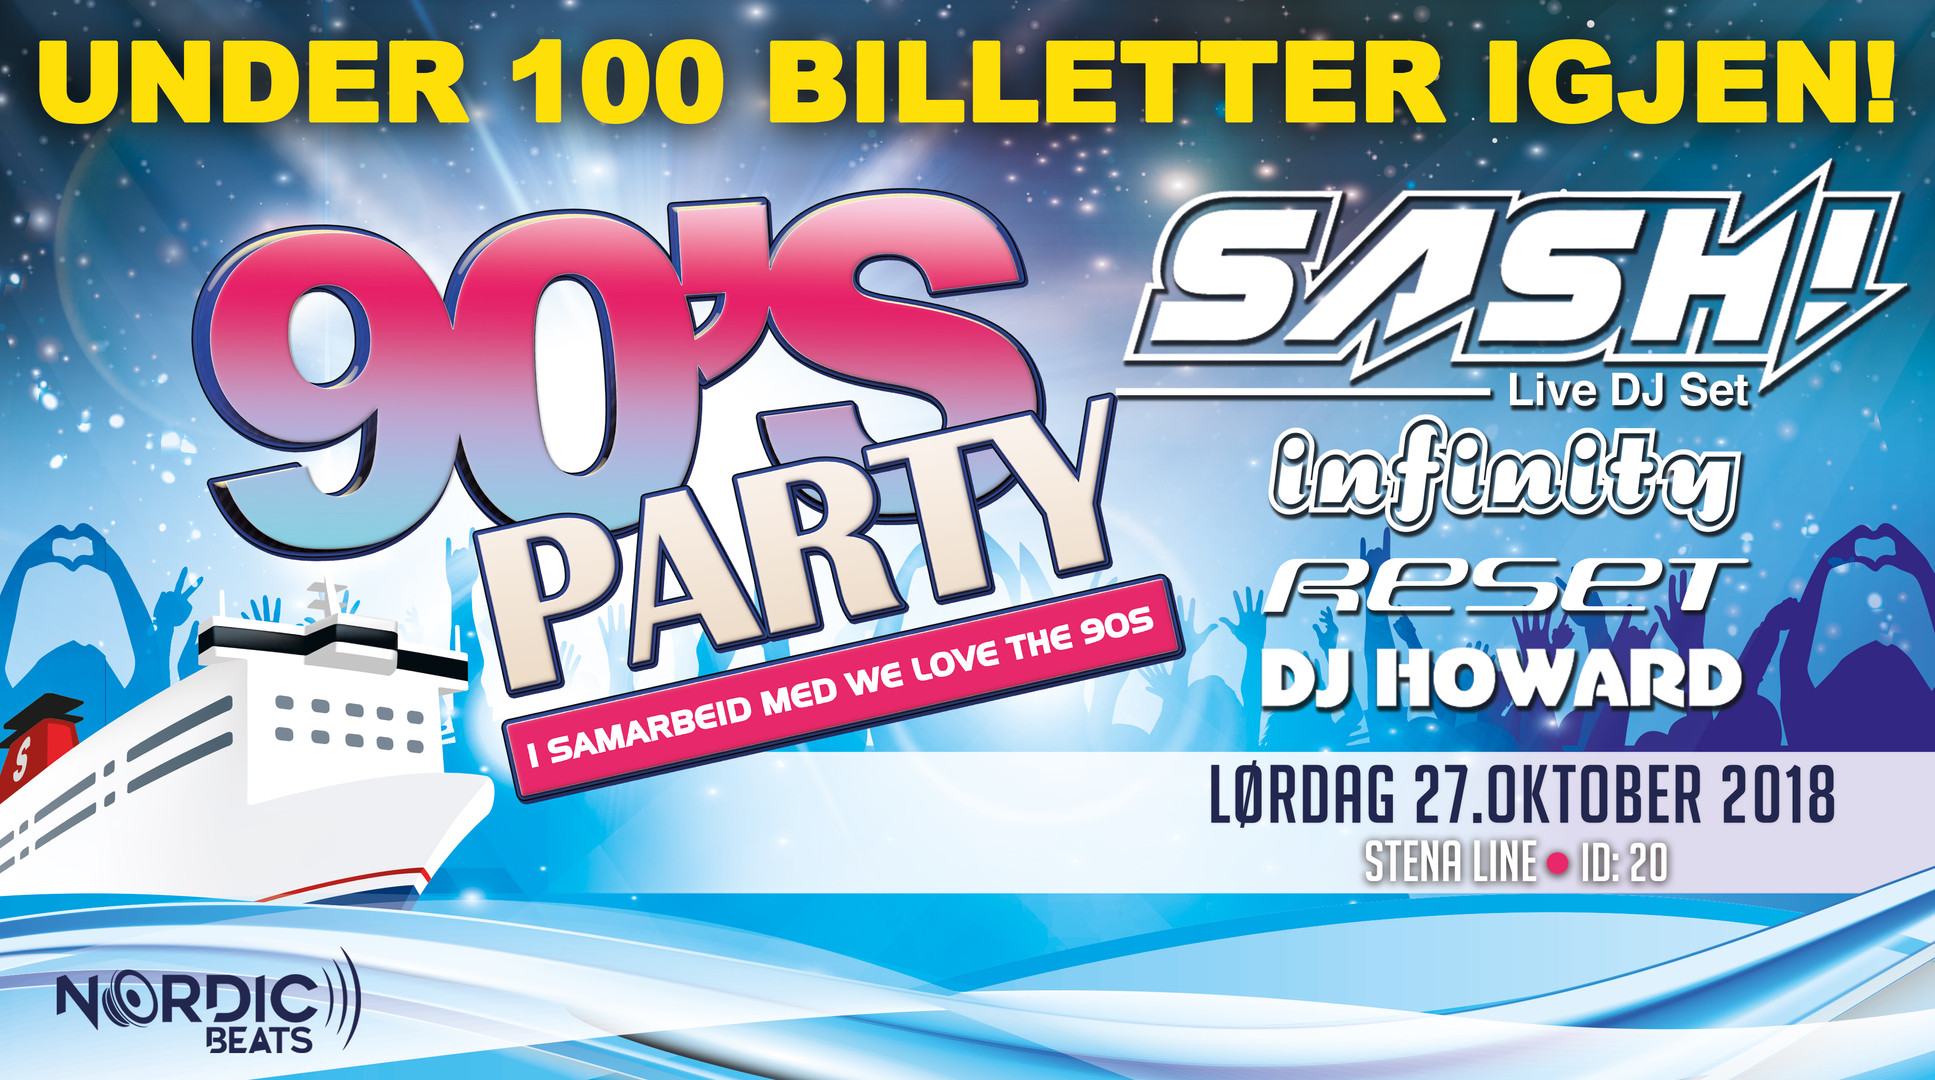 90S_Party_2018_FBbanner_Stenaline_v3.jpg